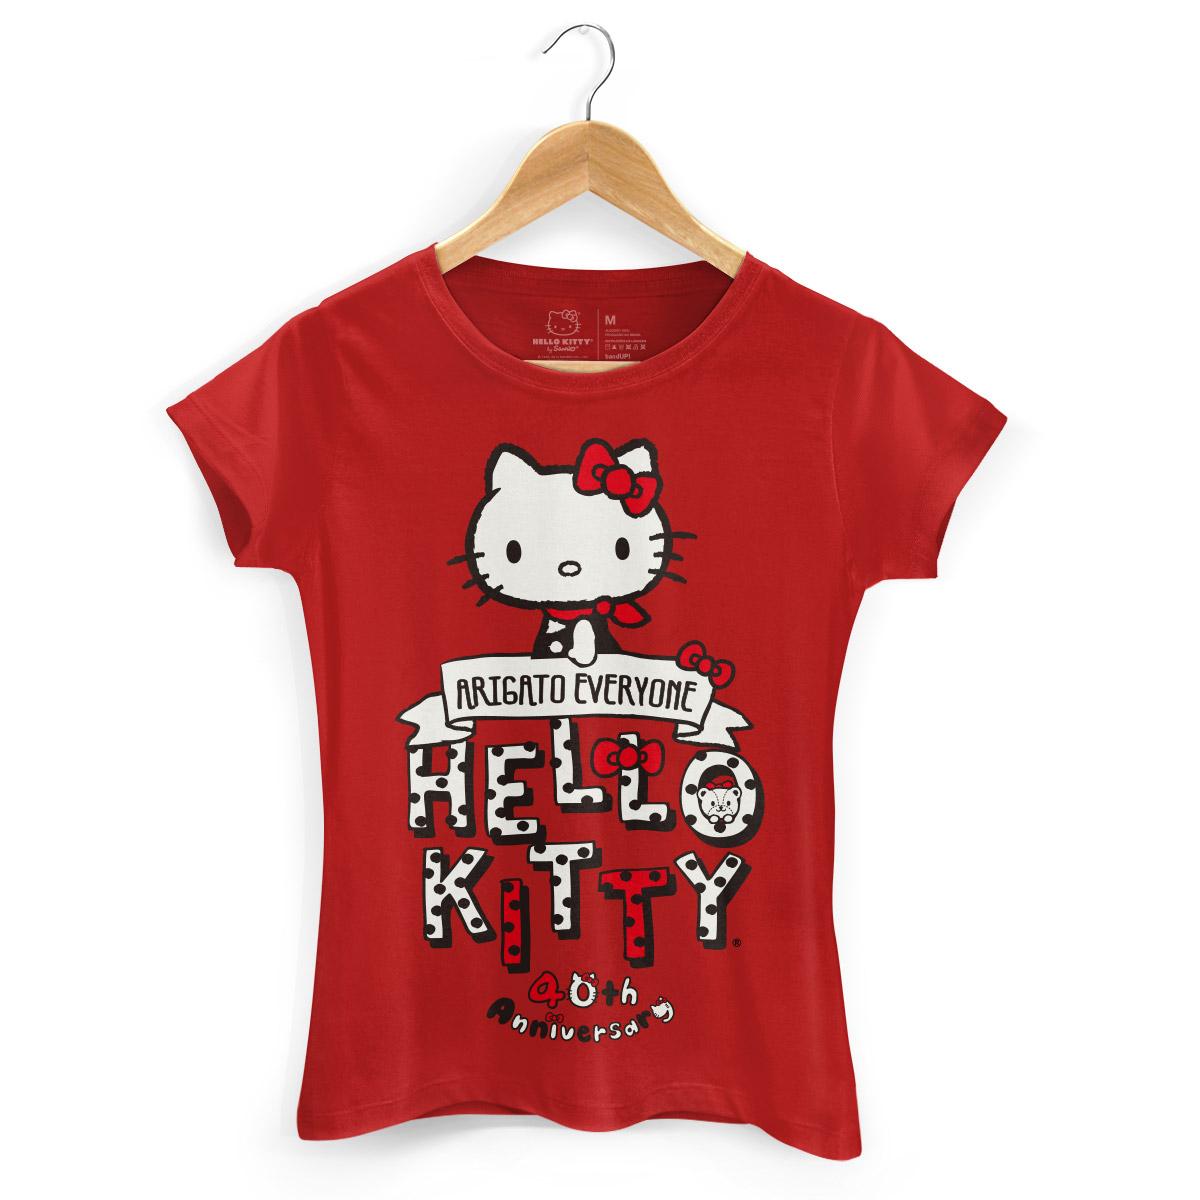 Camiseta Hello Kitty Arigato Everyone 2